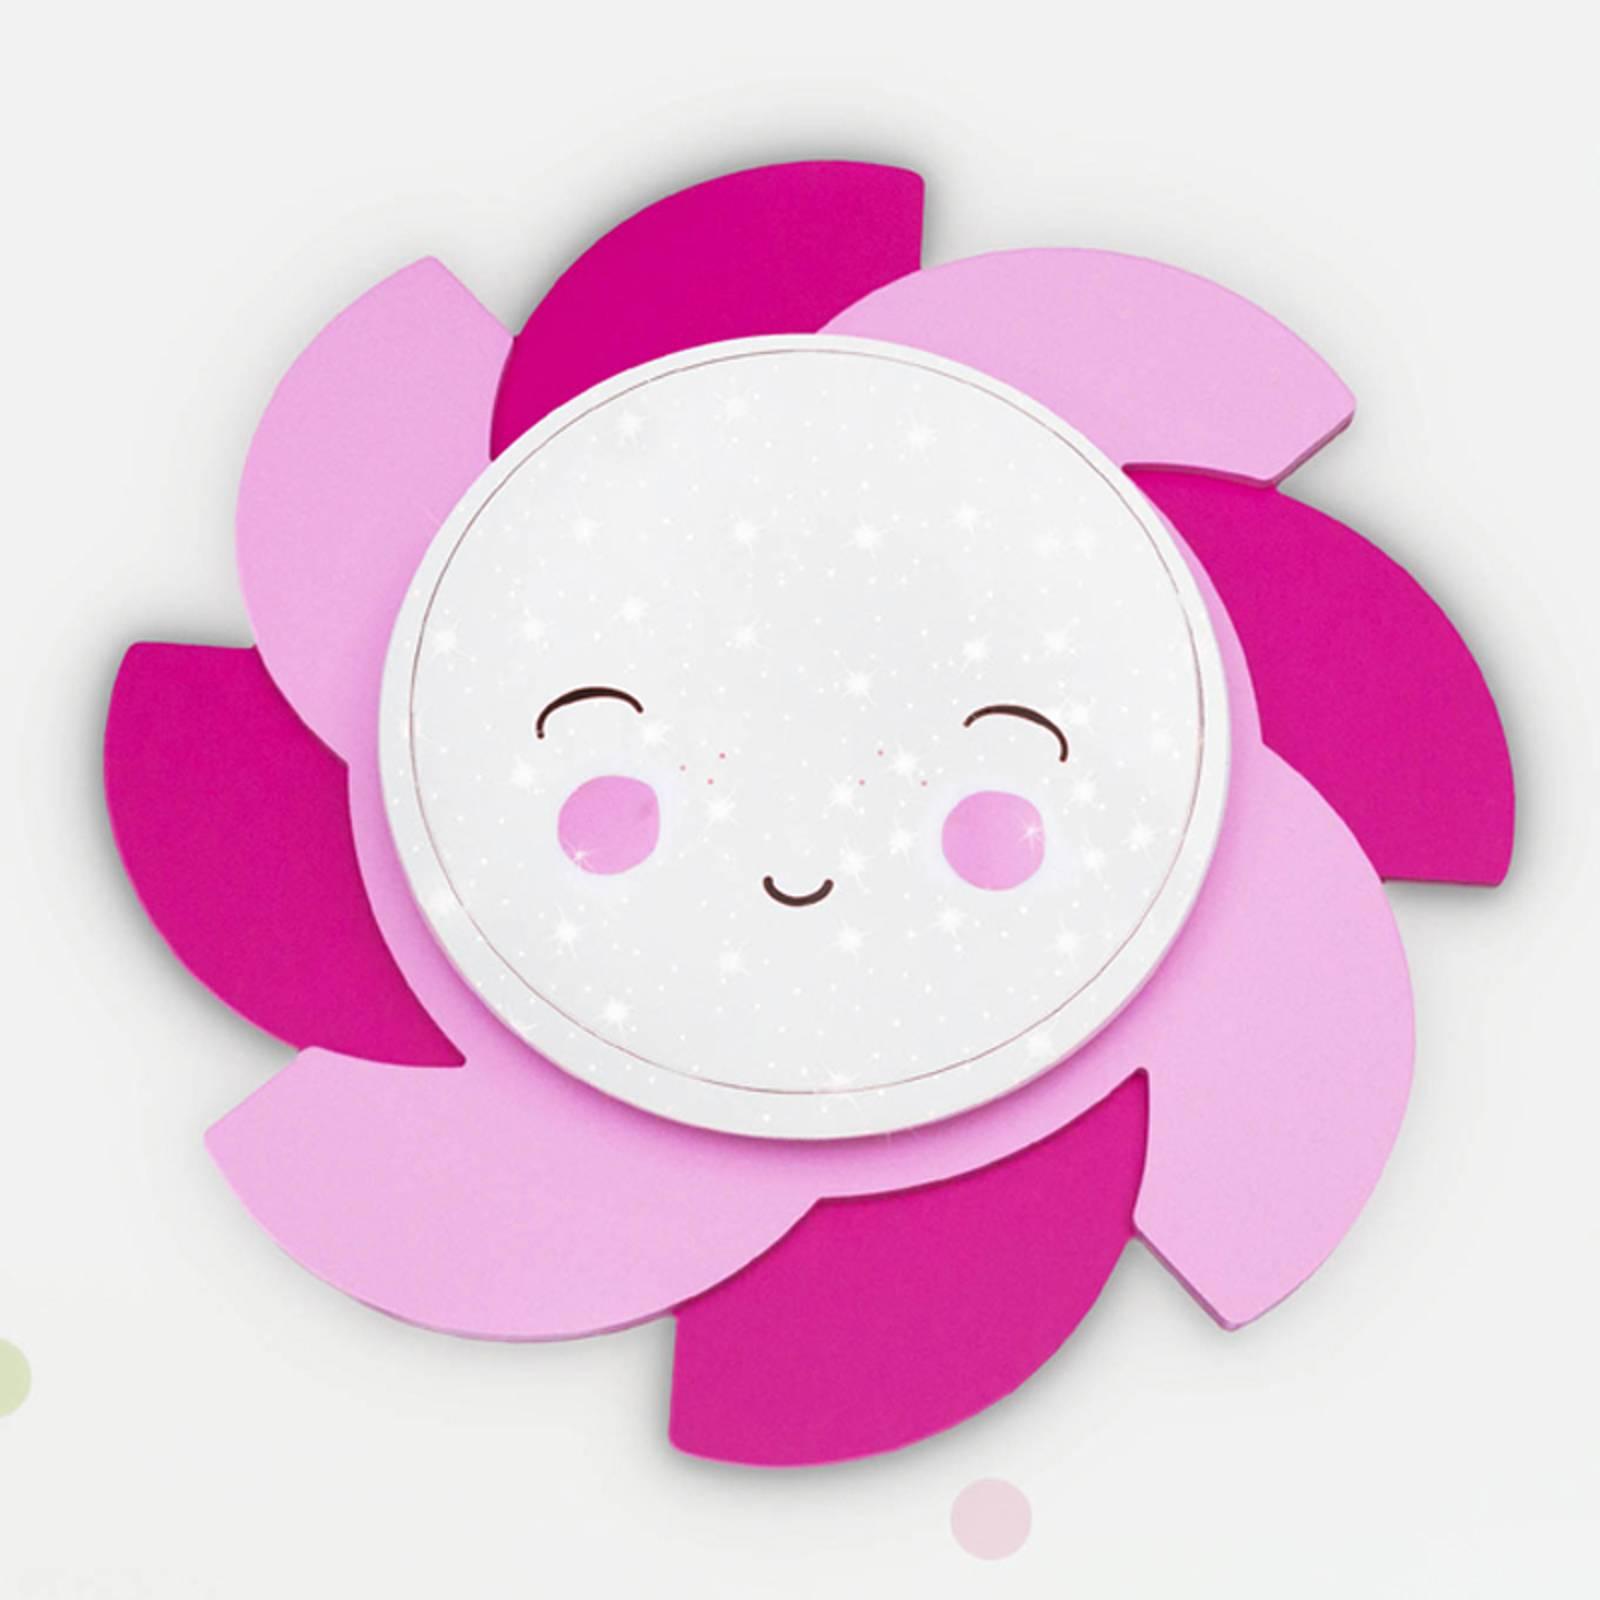 LED wandlamp zon Starlight Smile, roze